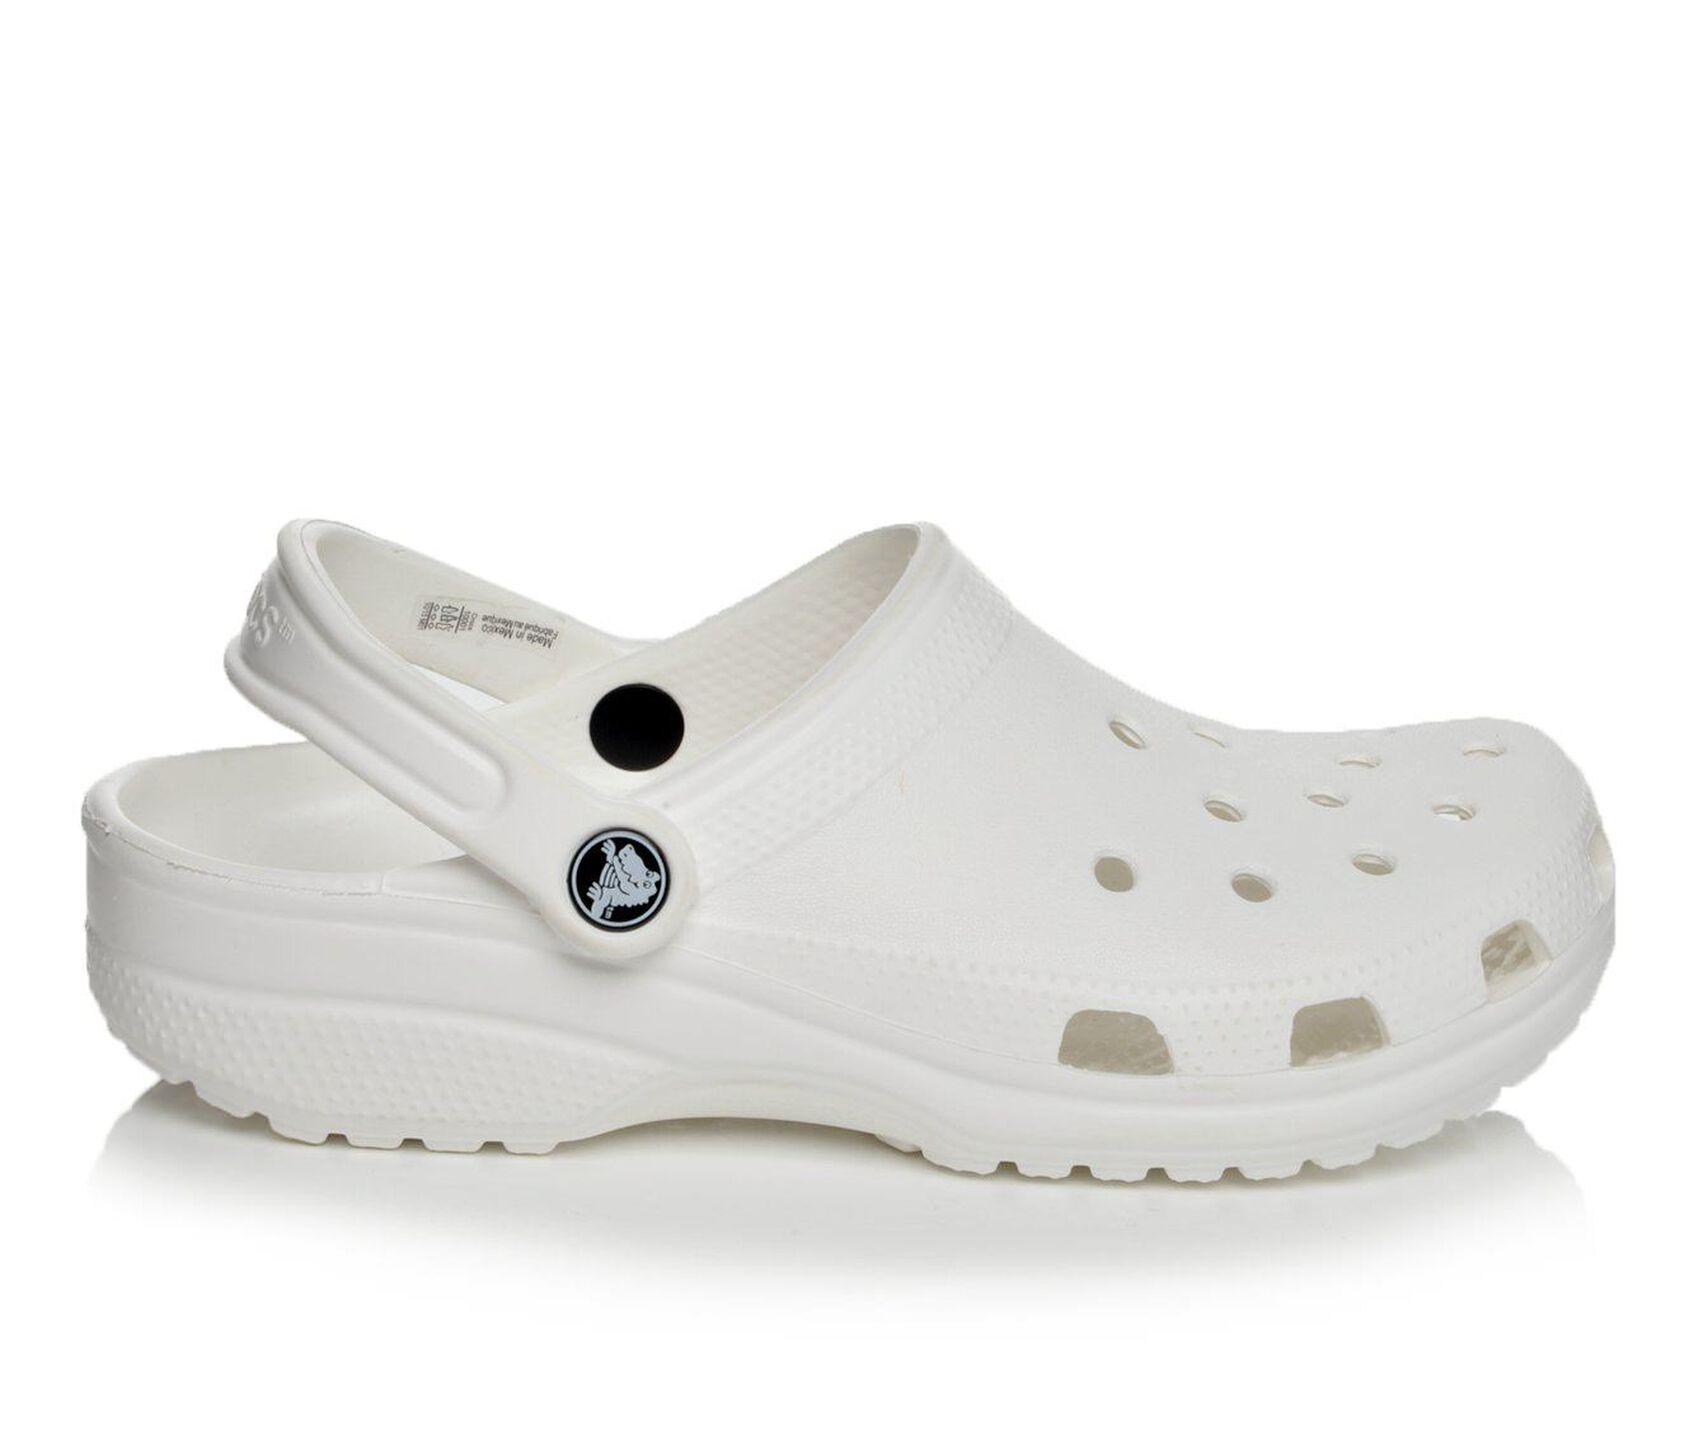 b93ec4af612 Women's Crocs Classic Clogs